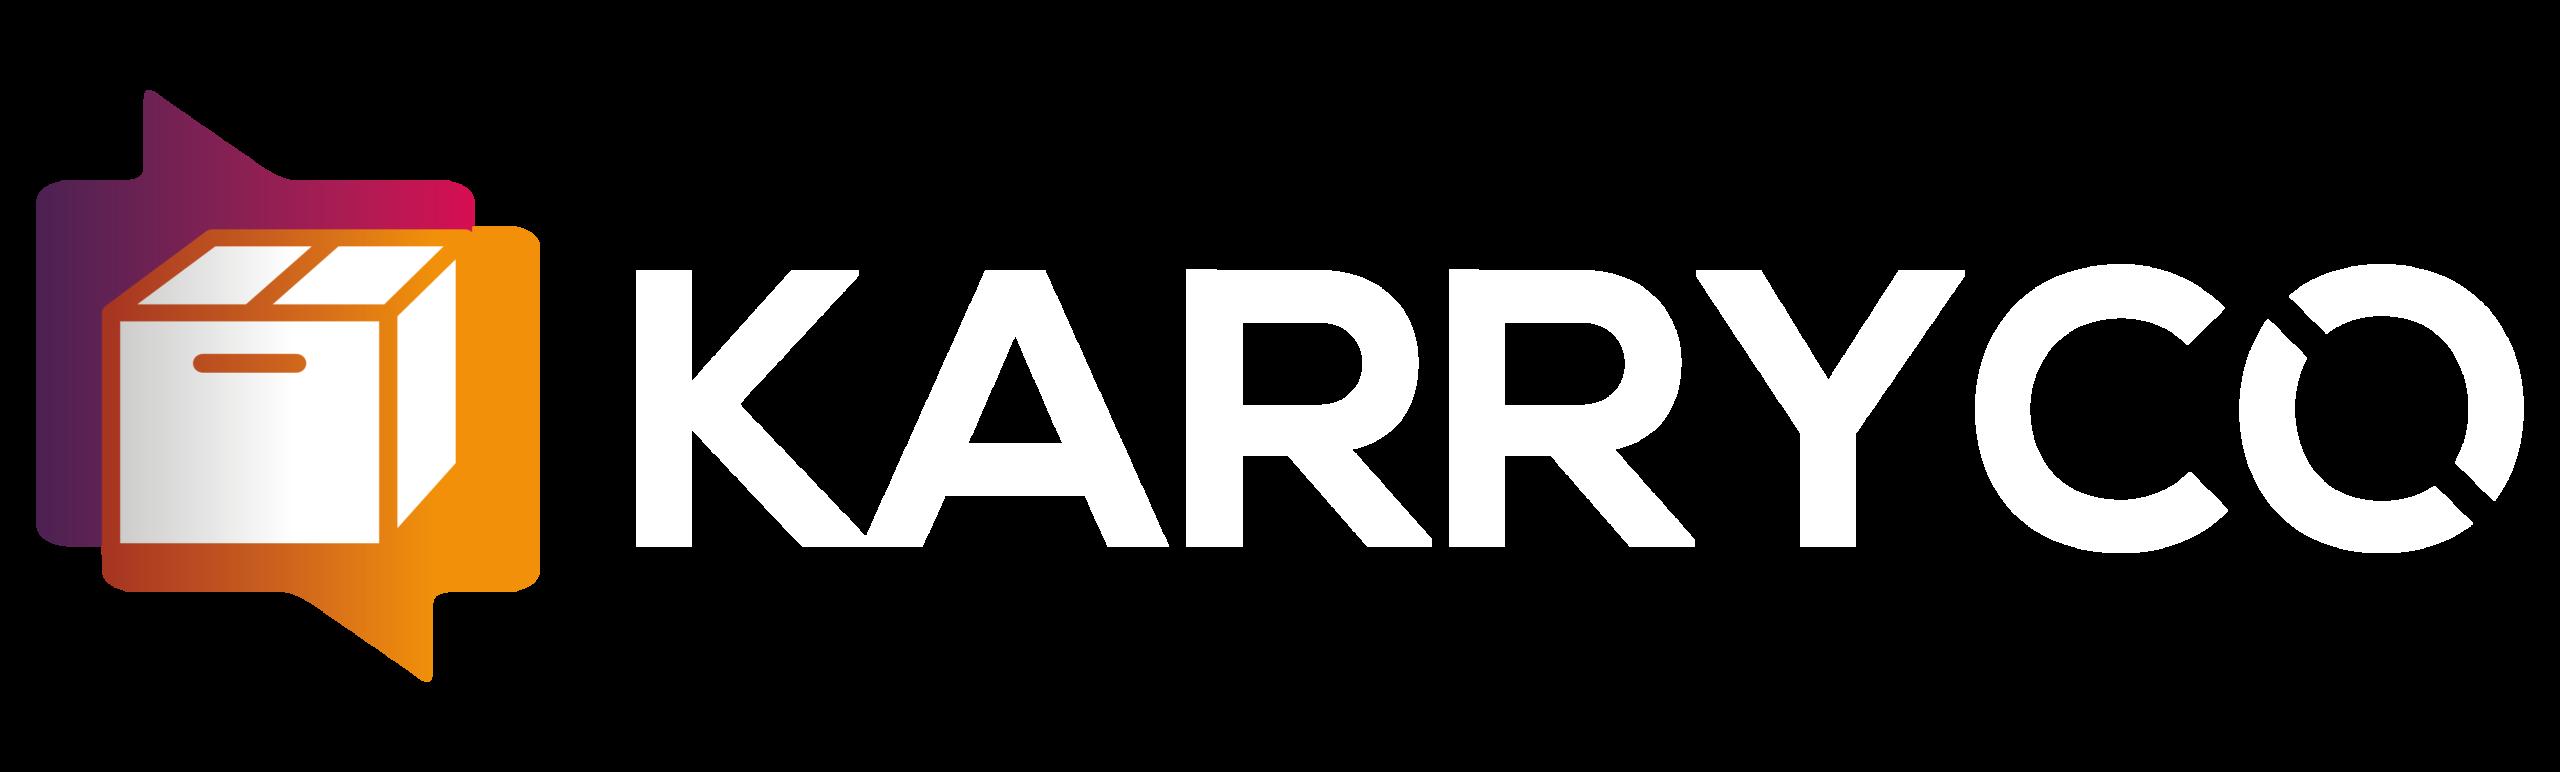 KarryMAG